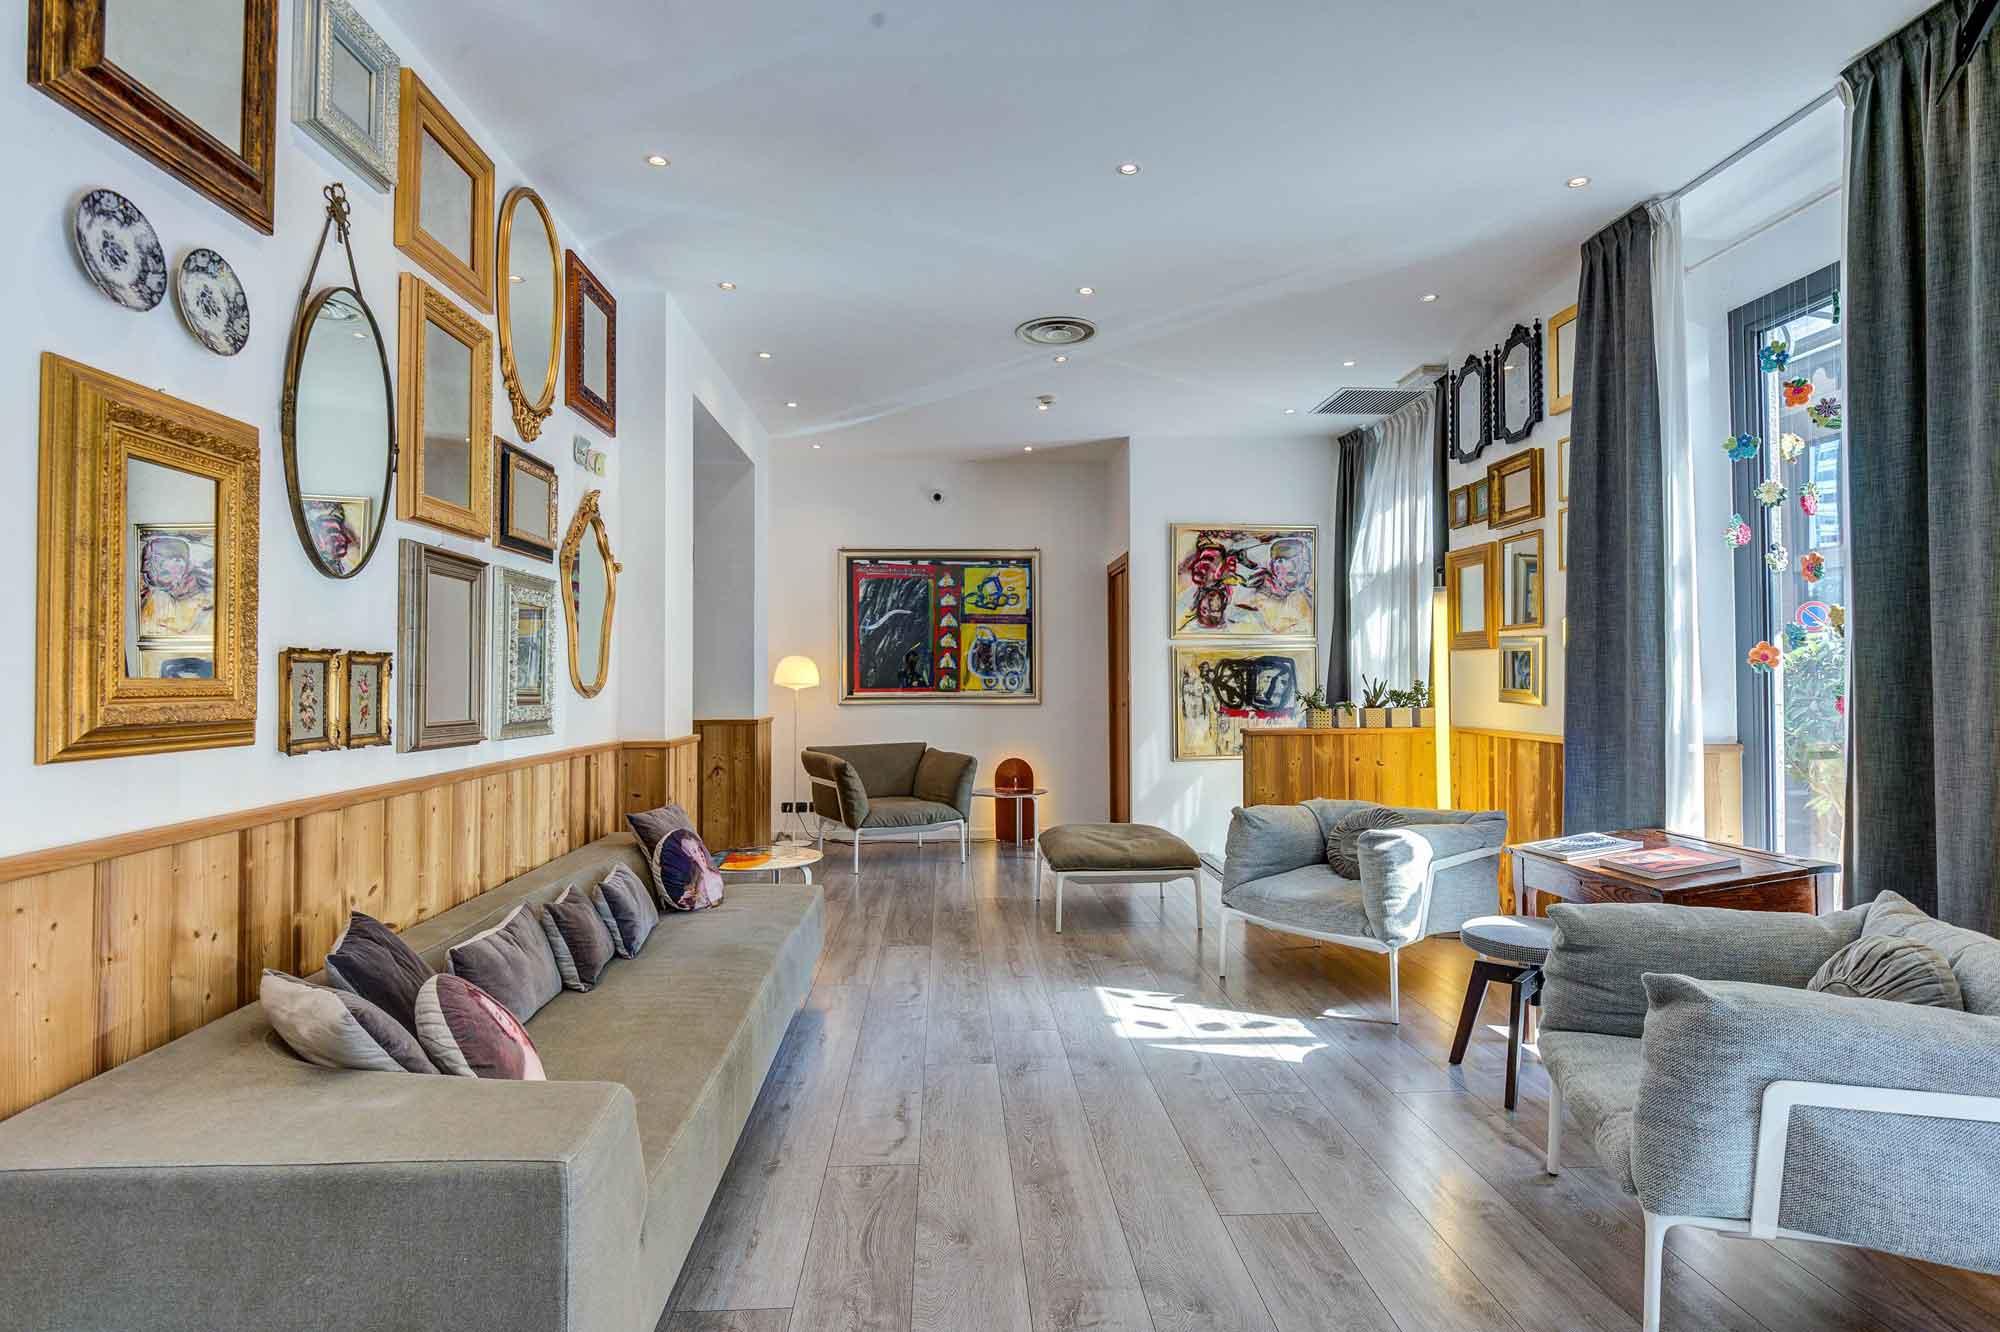 Hotel Bernina Milan, Italie : Lobby / Réception